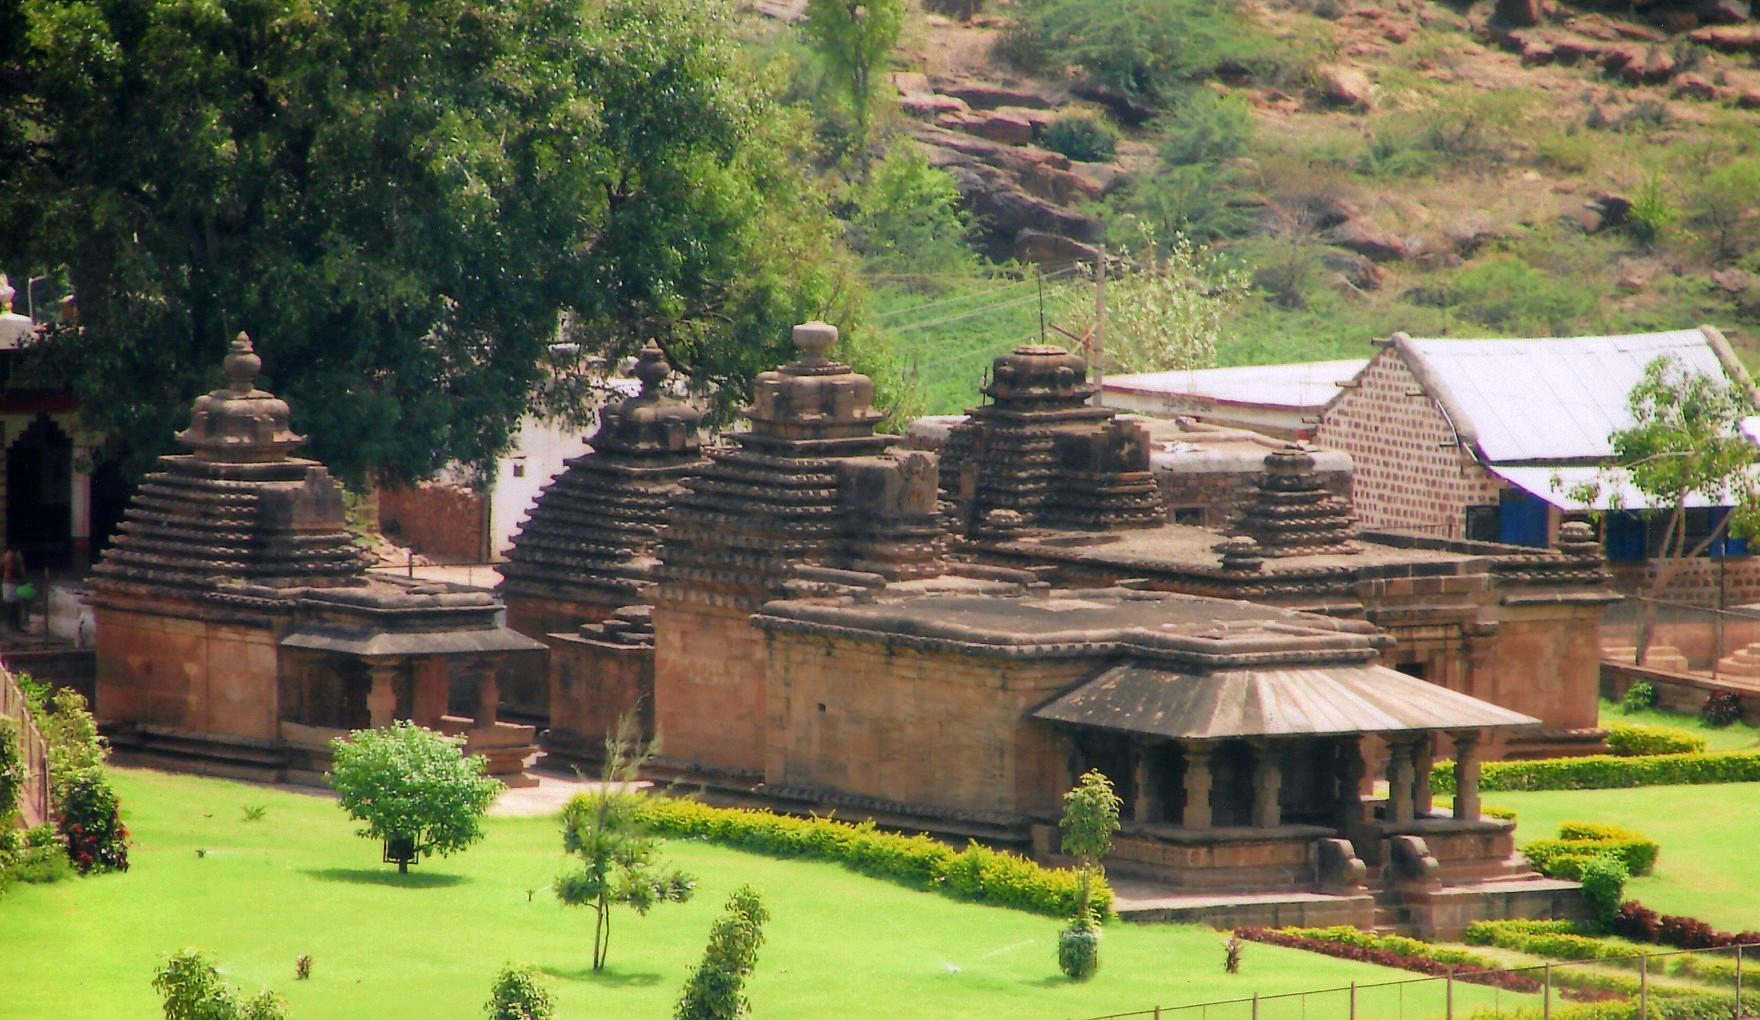 Mallikarjuna group of temples at Badami in Bagalkot district, Karnataka